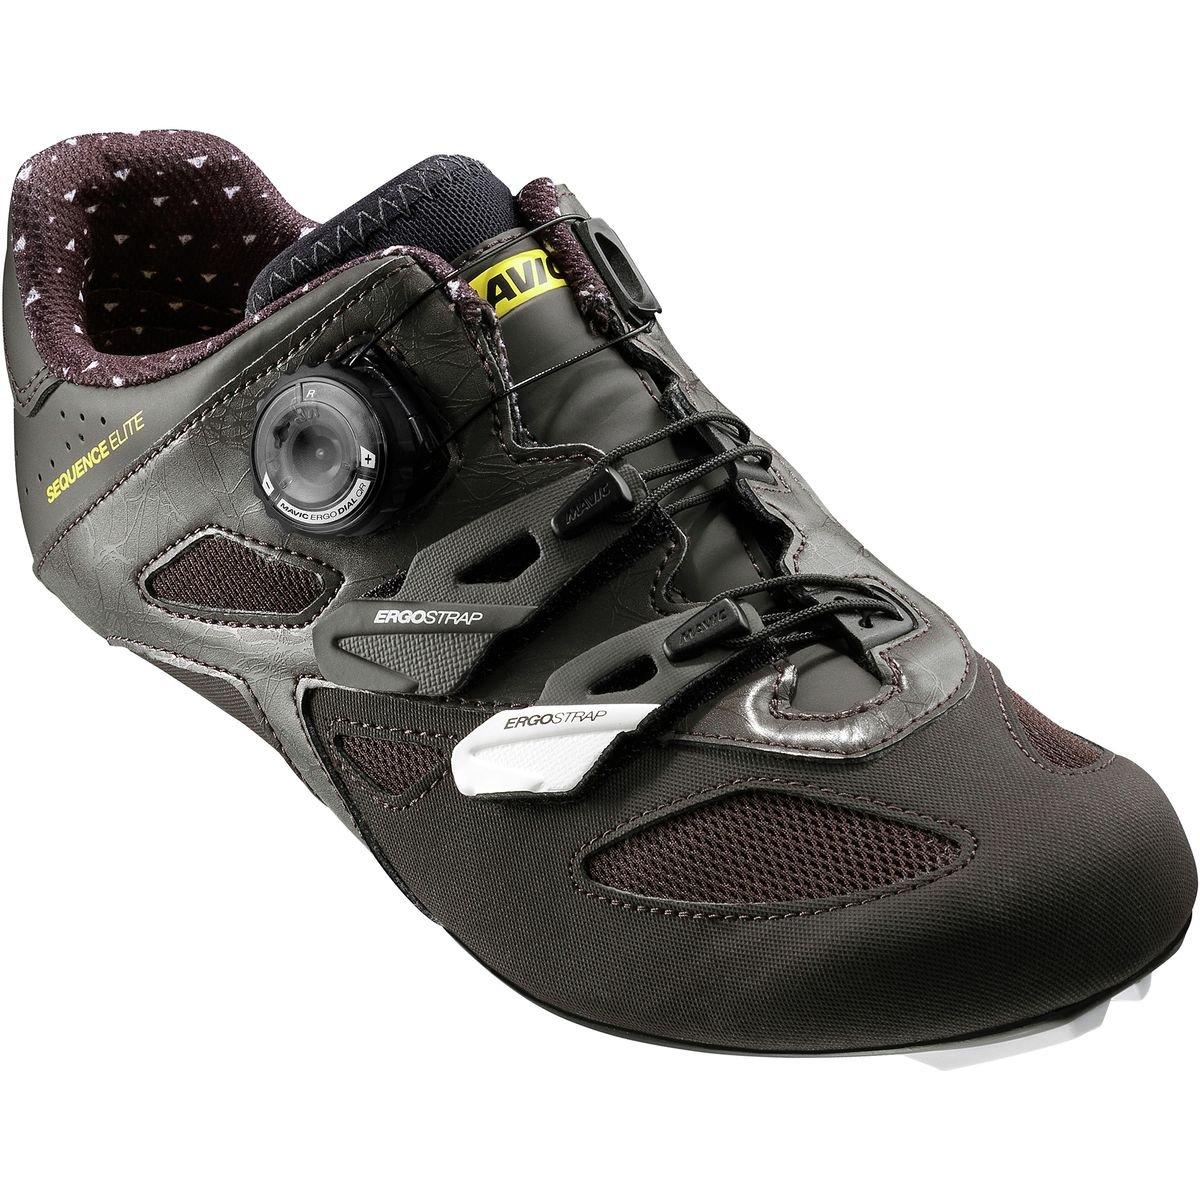 Mavic Sequence Elite Cycling Shoe - Women's After Dark/Black, US 5.5/UK 4.0